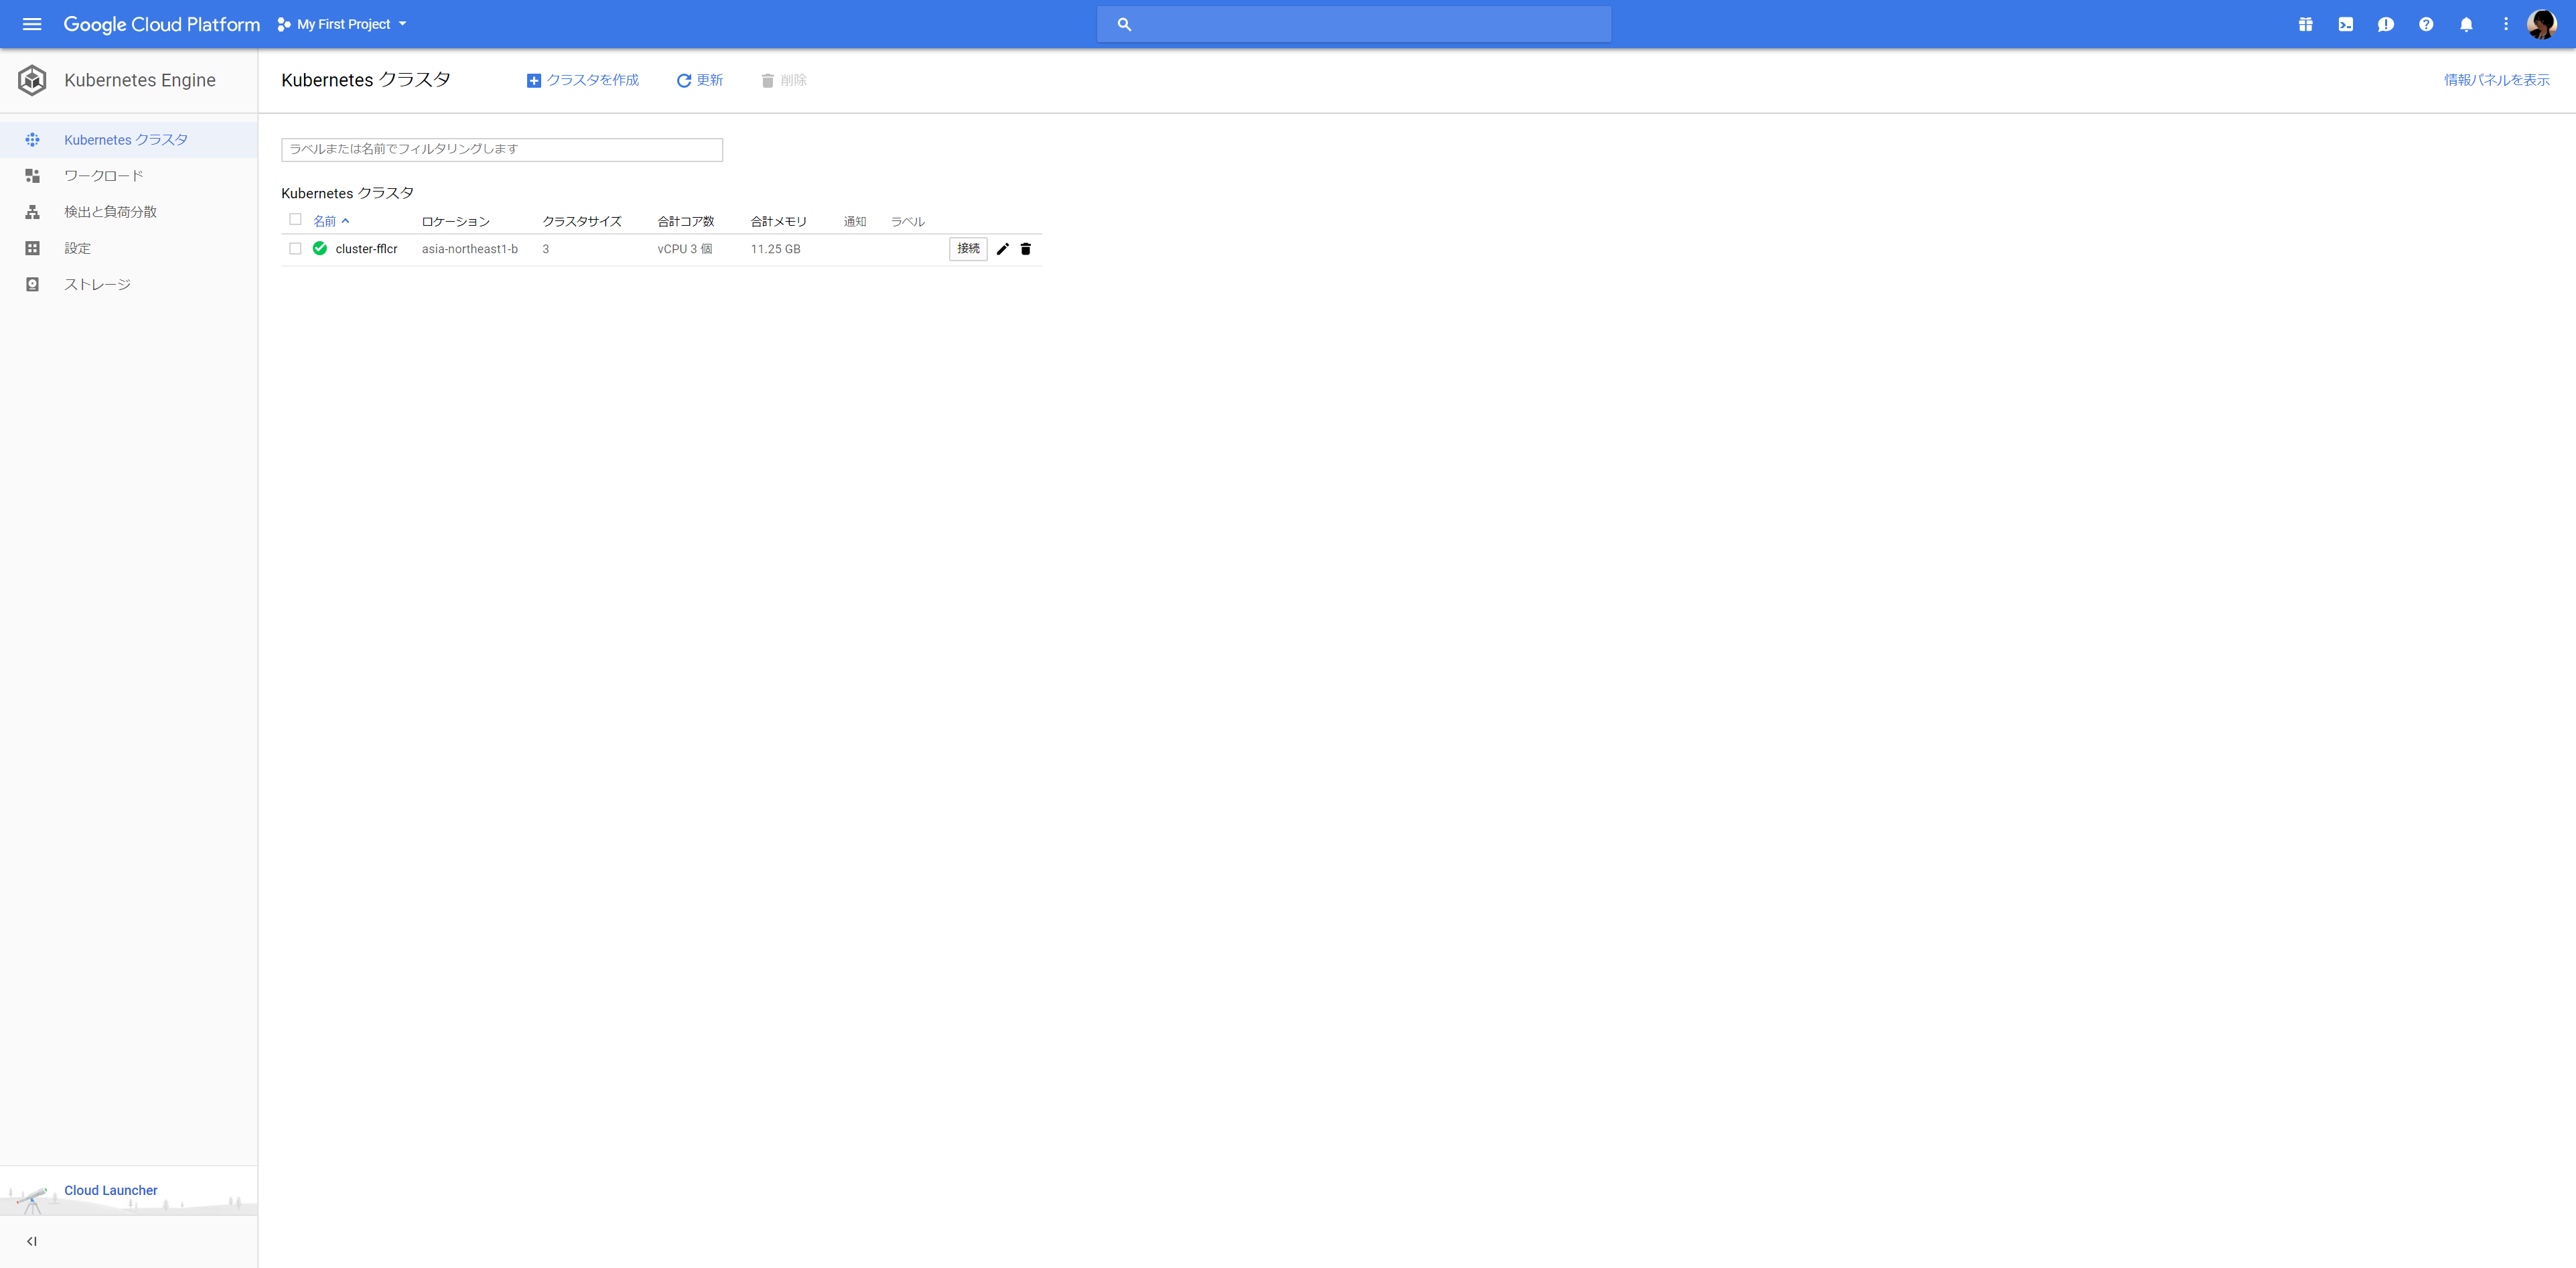 screencapture-console-cloud-google-kubernetes-list-2018-04-22-11_50_19.png